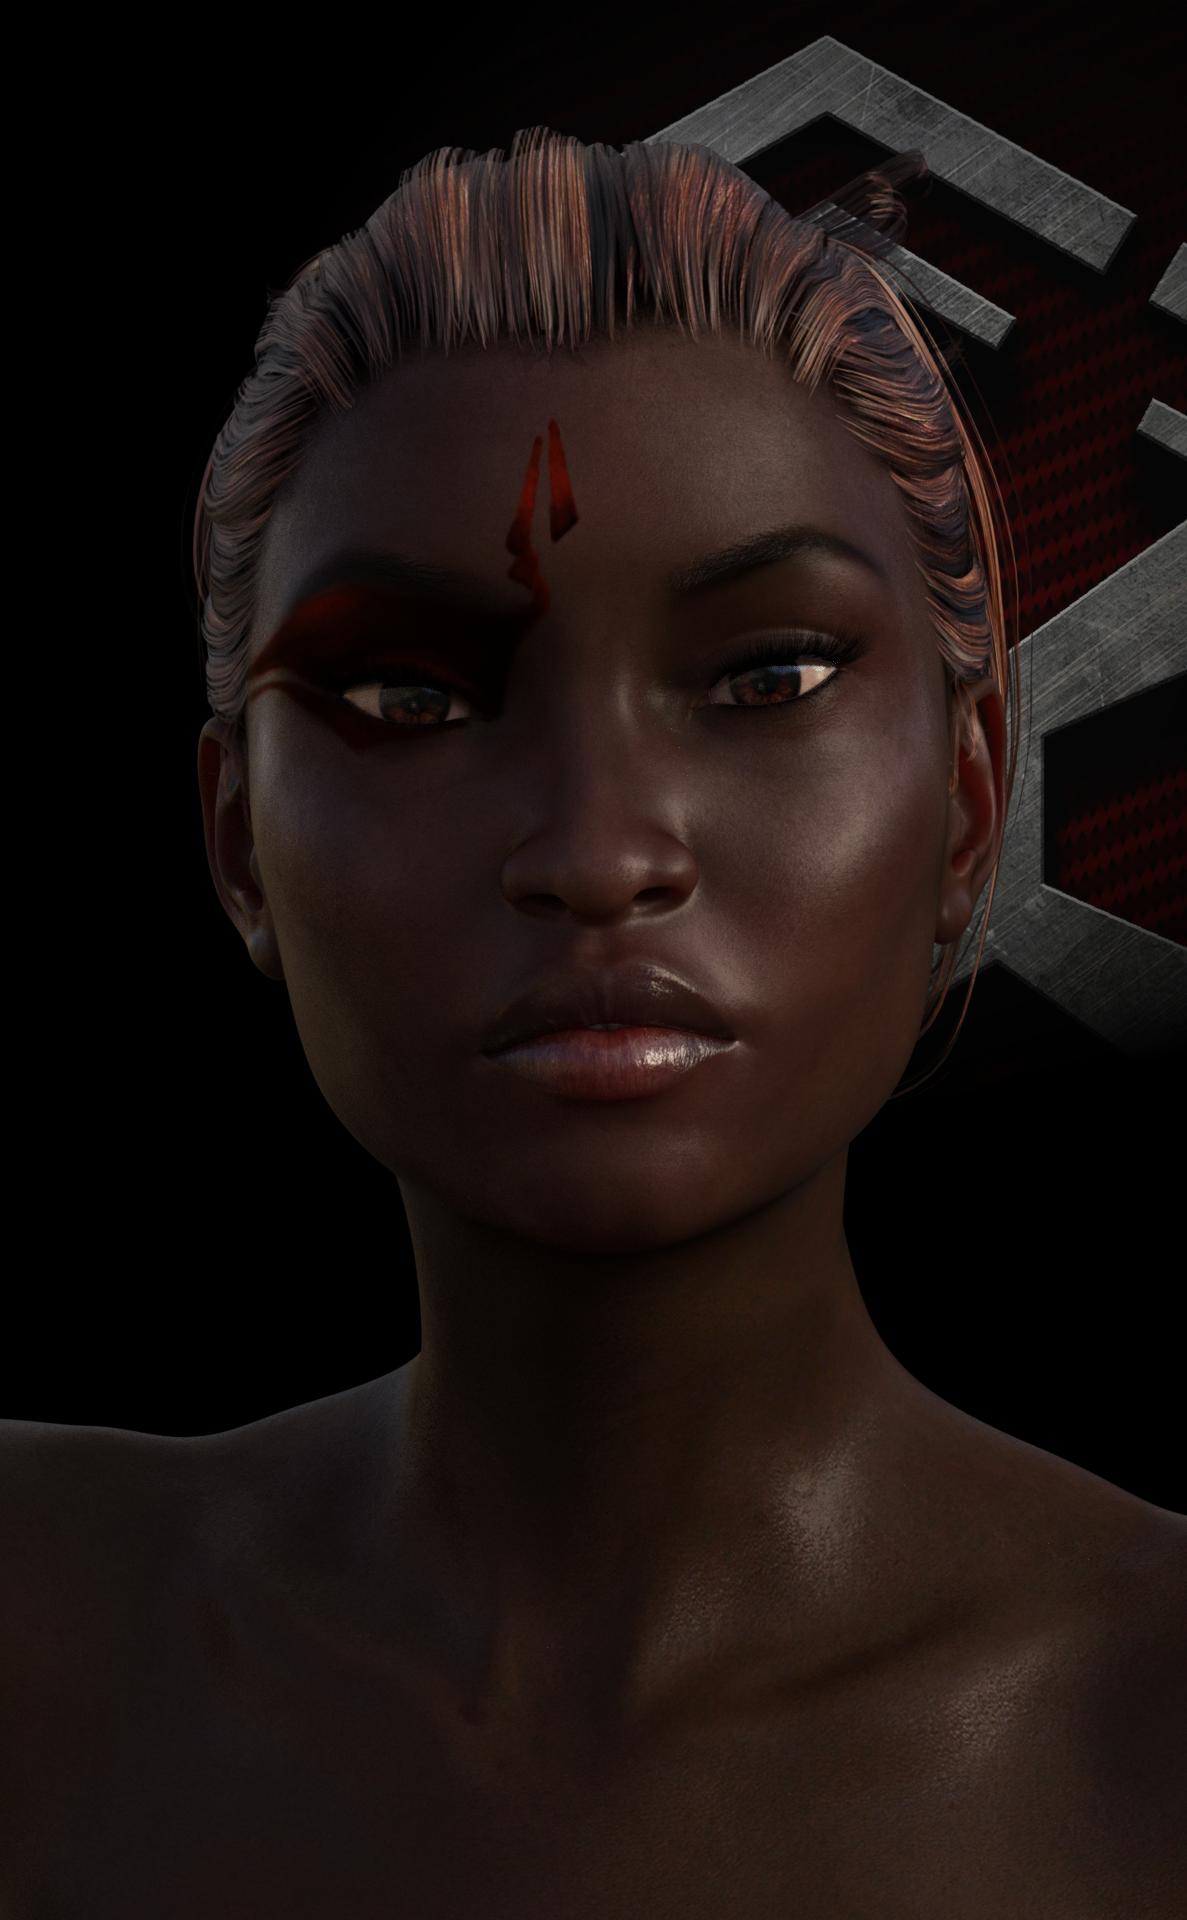 Human Female - Imperial - SWTOR era